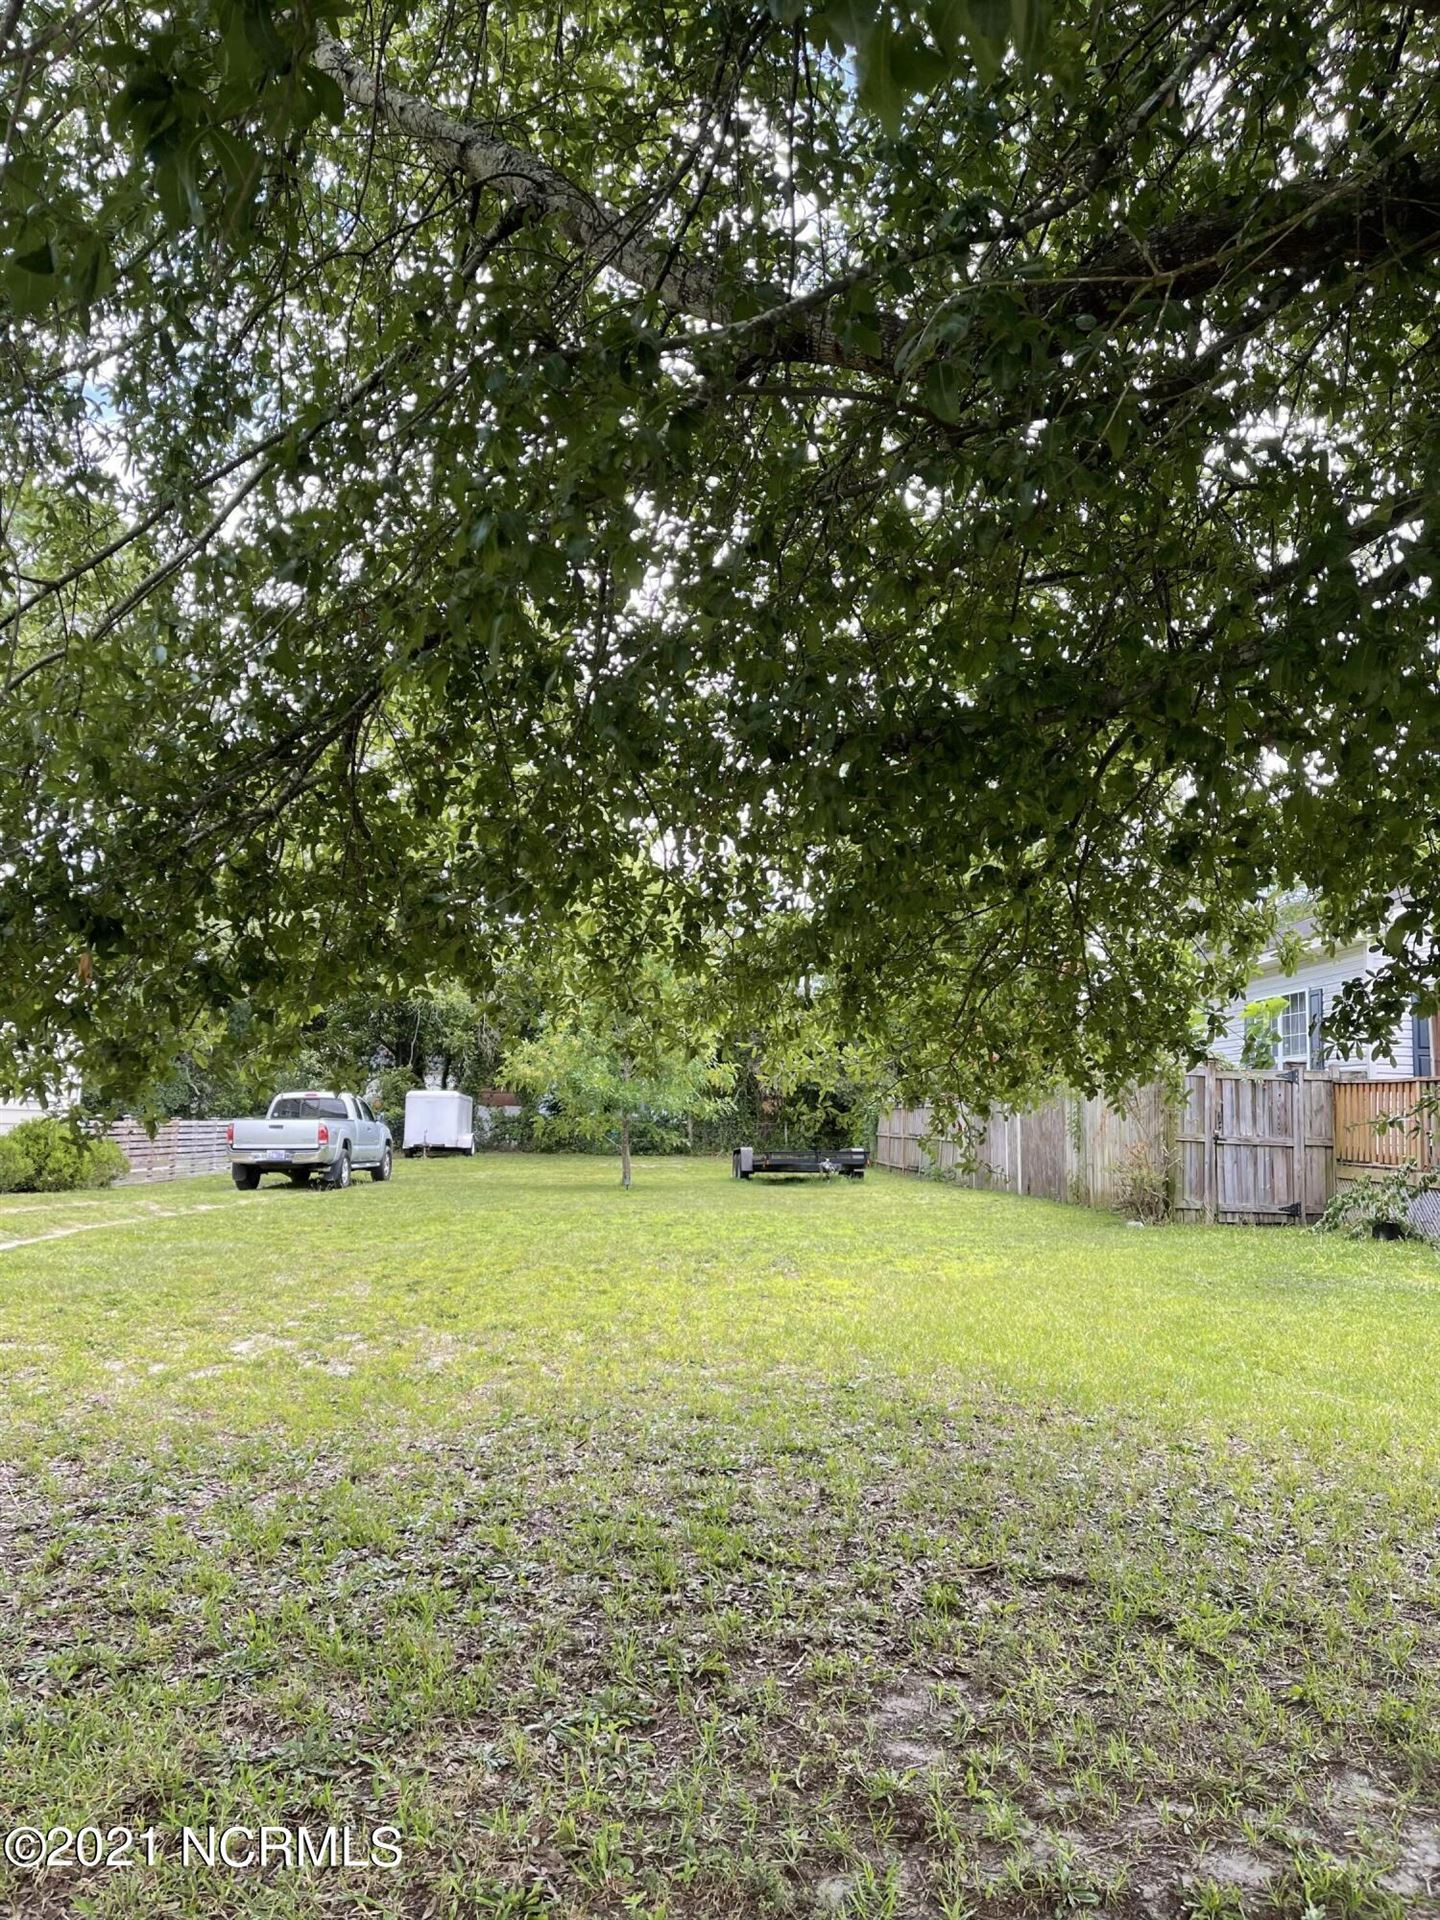 Photo for 2133 Jefferson Street, Wilmington, NC 28401 (MLS # 100280636)